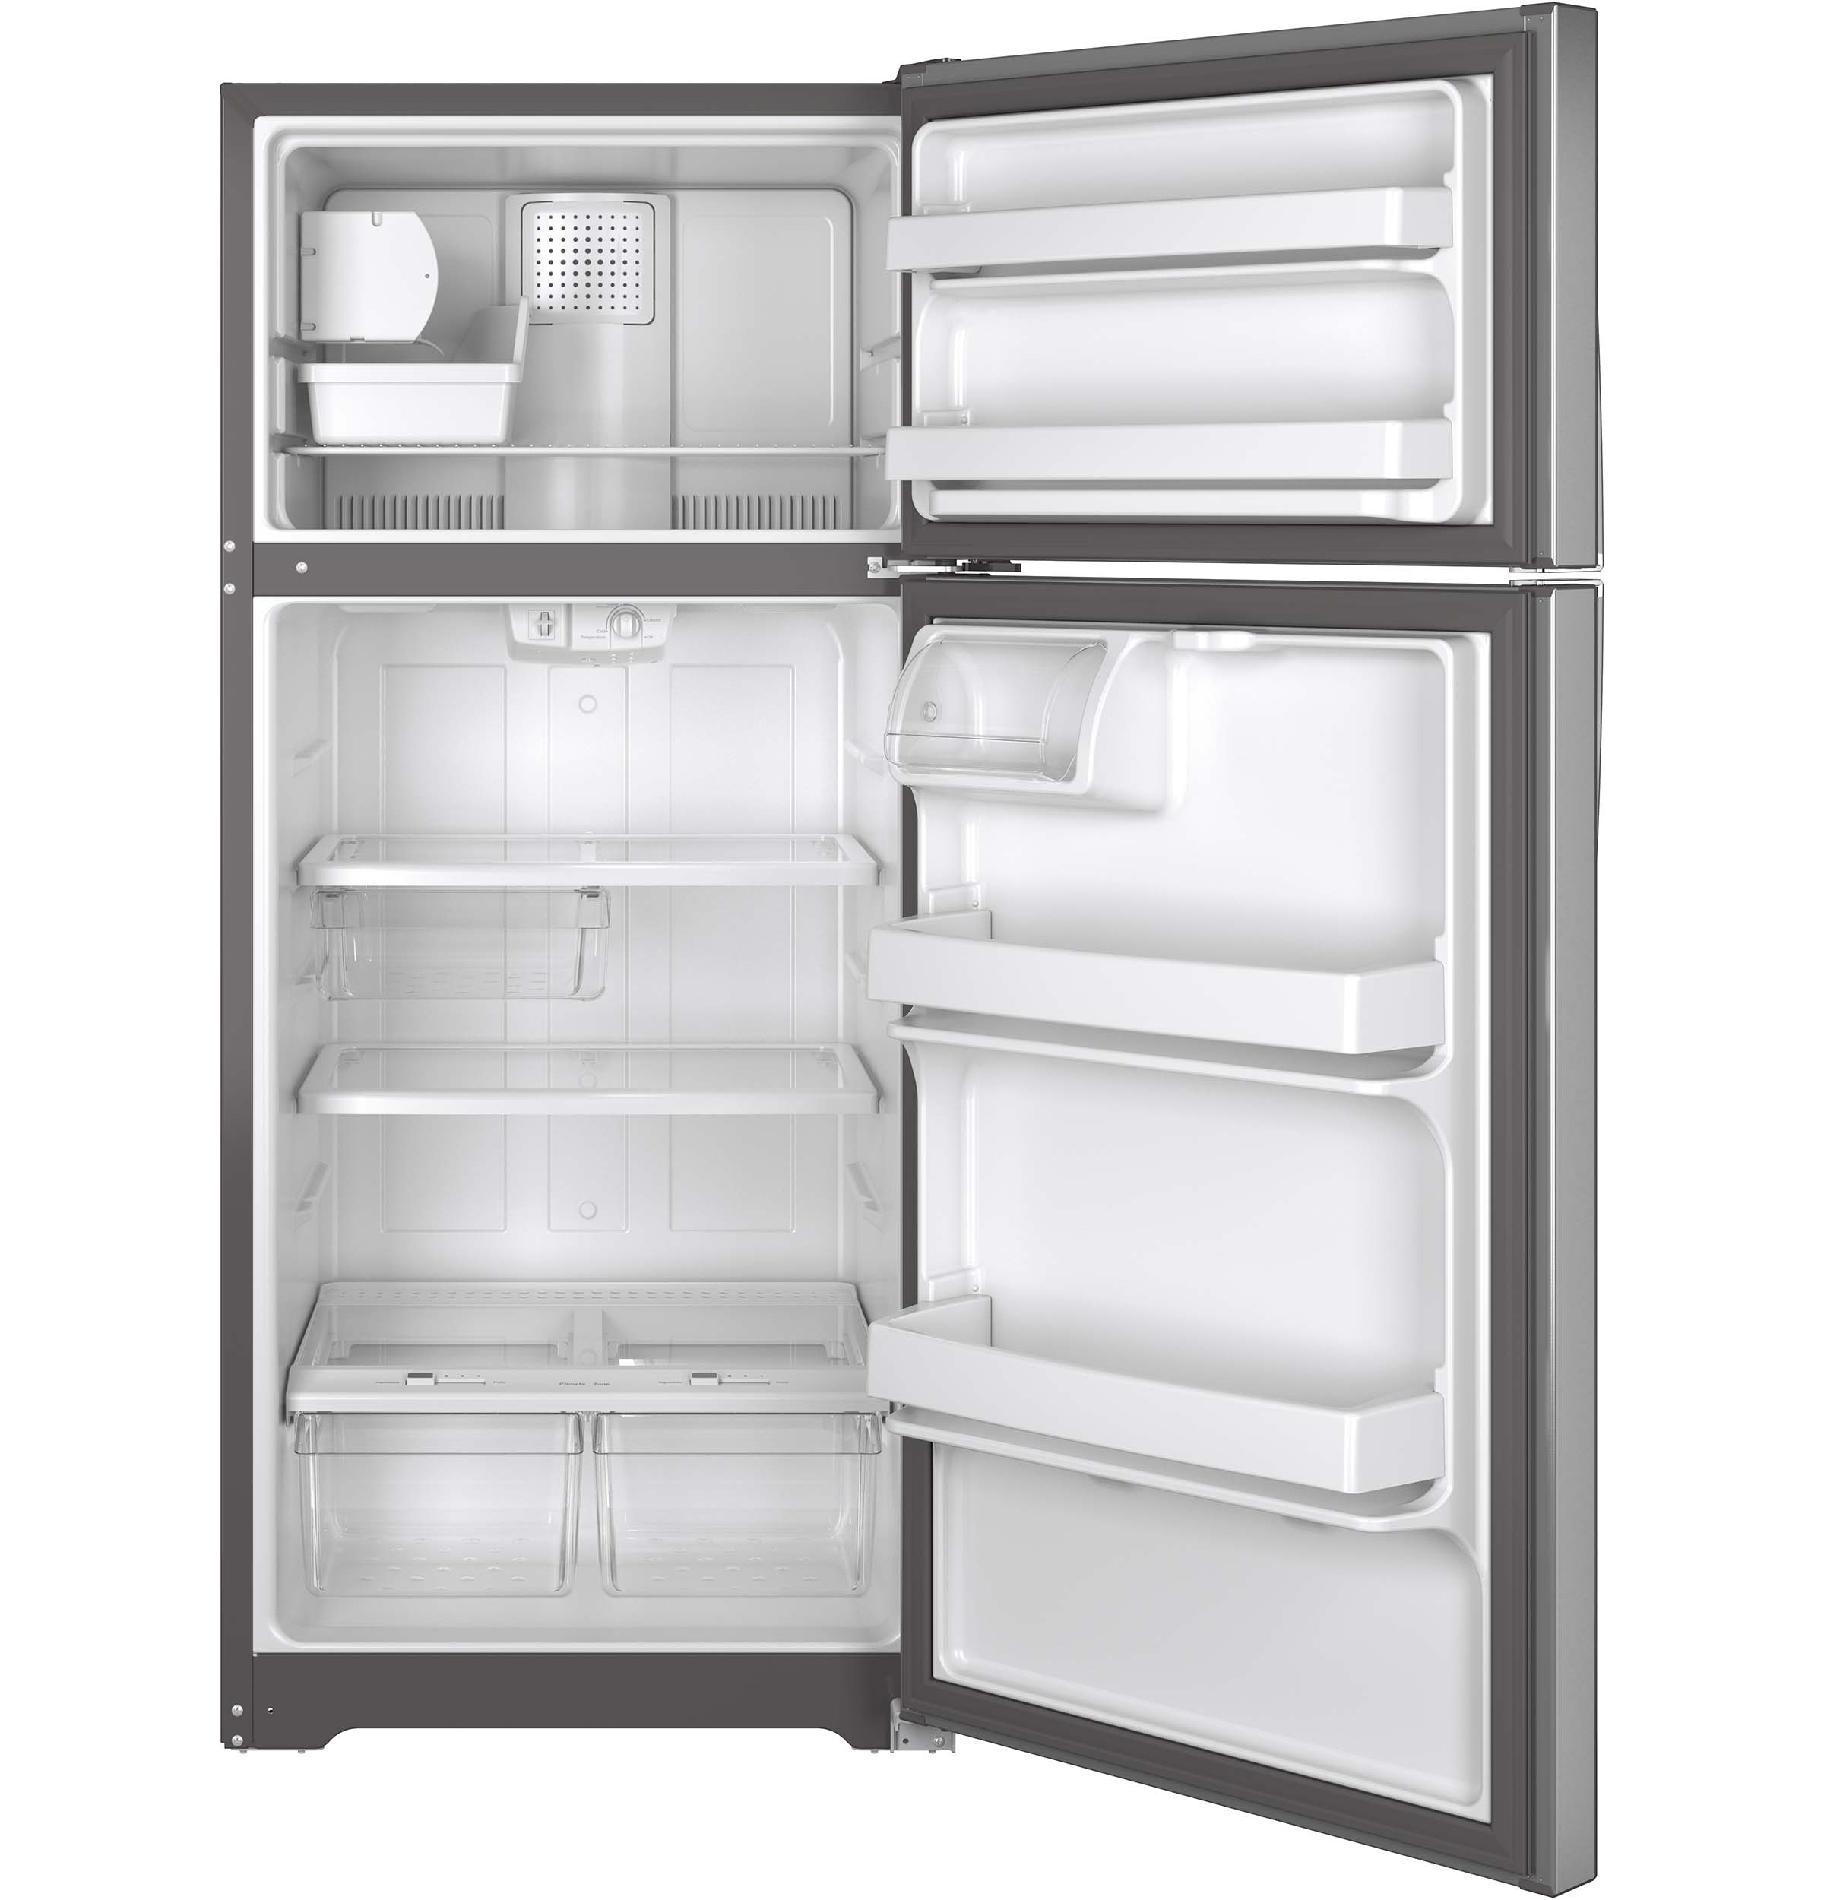 GE Appliances GIE16GSHSS 15.5 cu. ft. Top-Freezer Refrigerator - Stainless Steel